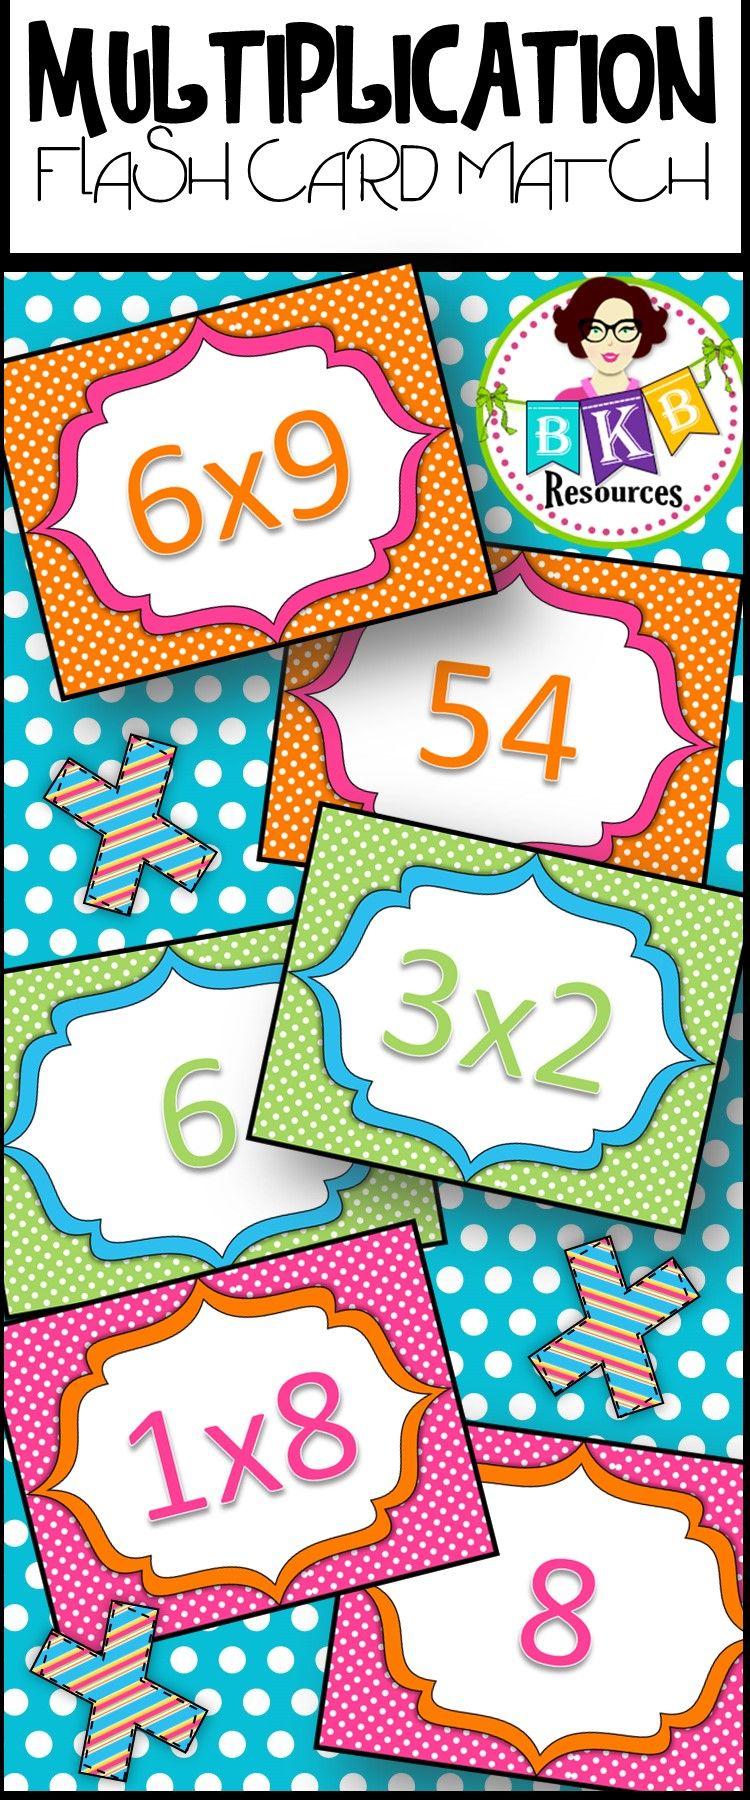 Multiplication Flash Card Match | Multiplication, Learning regarding Printable Multiplication Flashcards 0-12